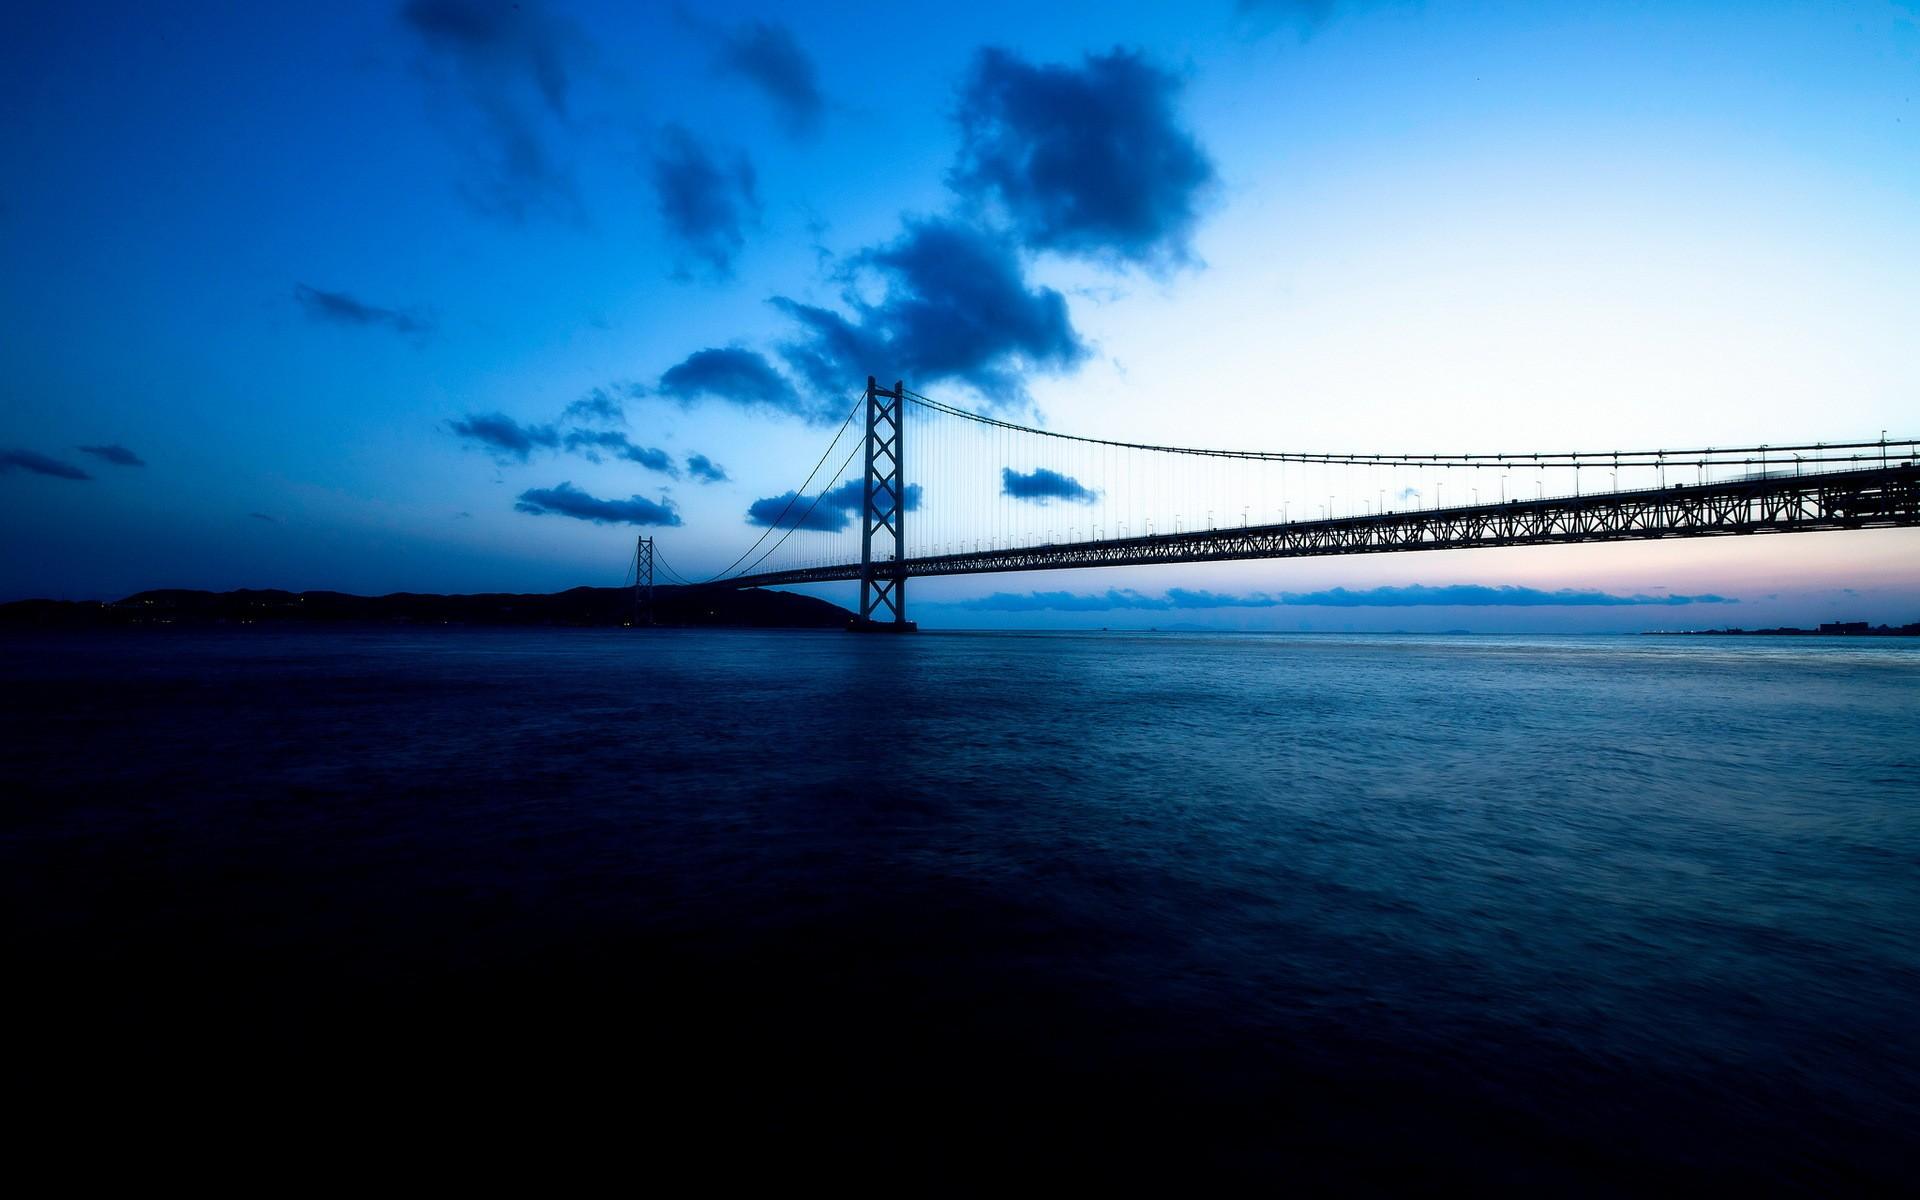 Bridge Bridges Ocean Sea Night Sky